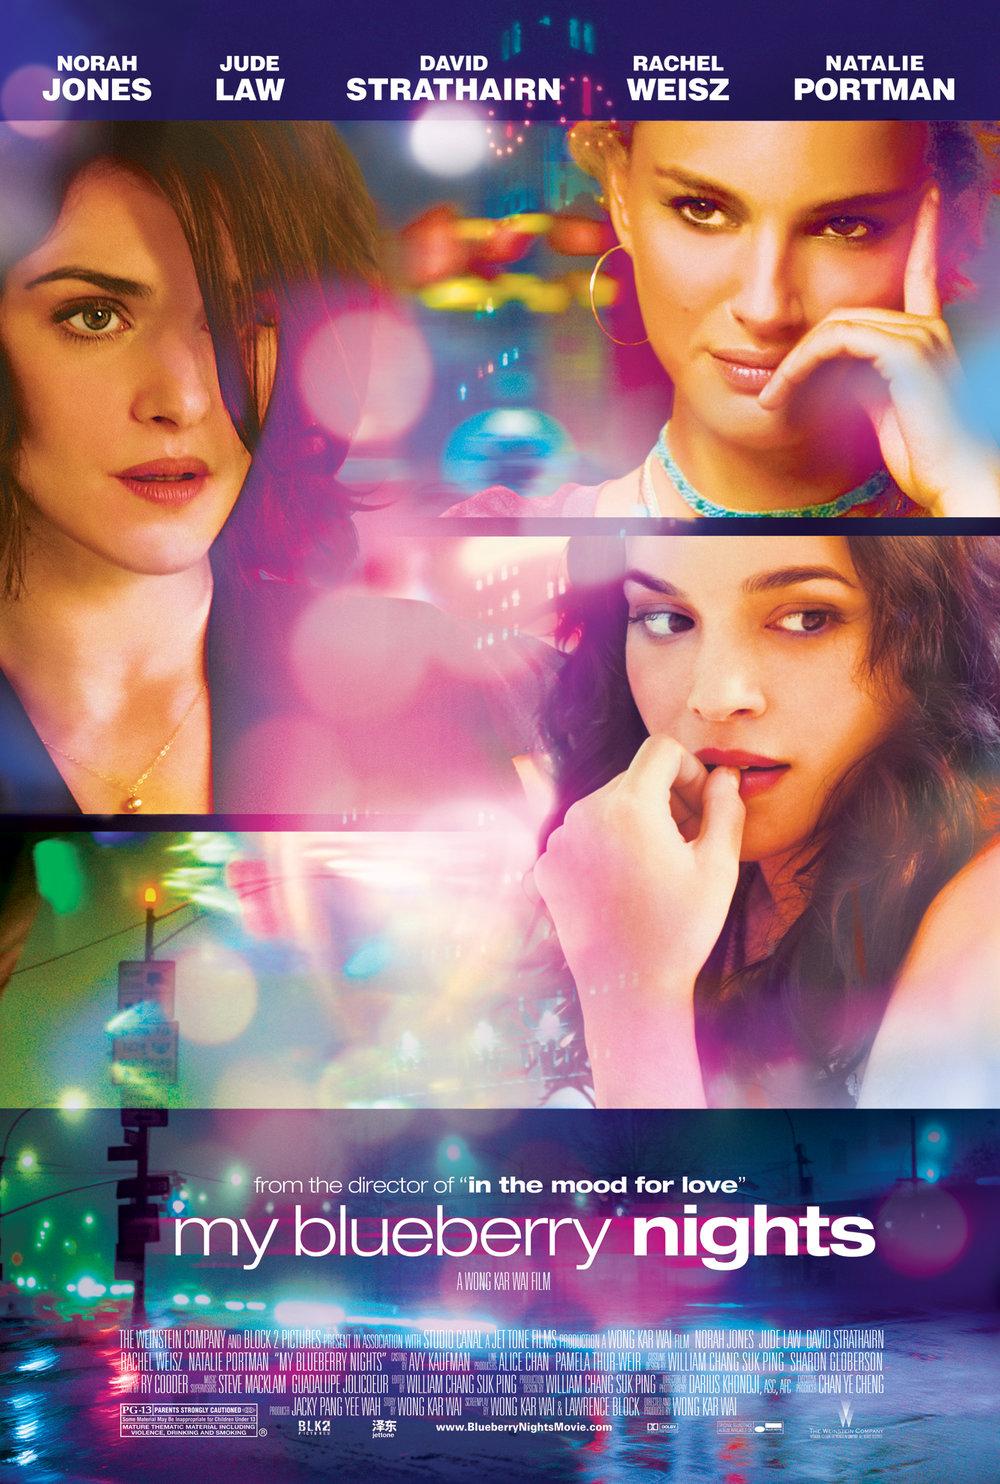 MY-BLUEBERRY-NIGHTS_Finish-0319-PRINTED.jpg